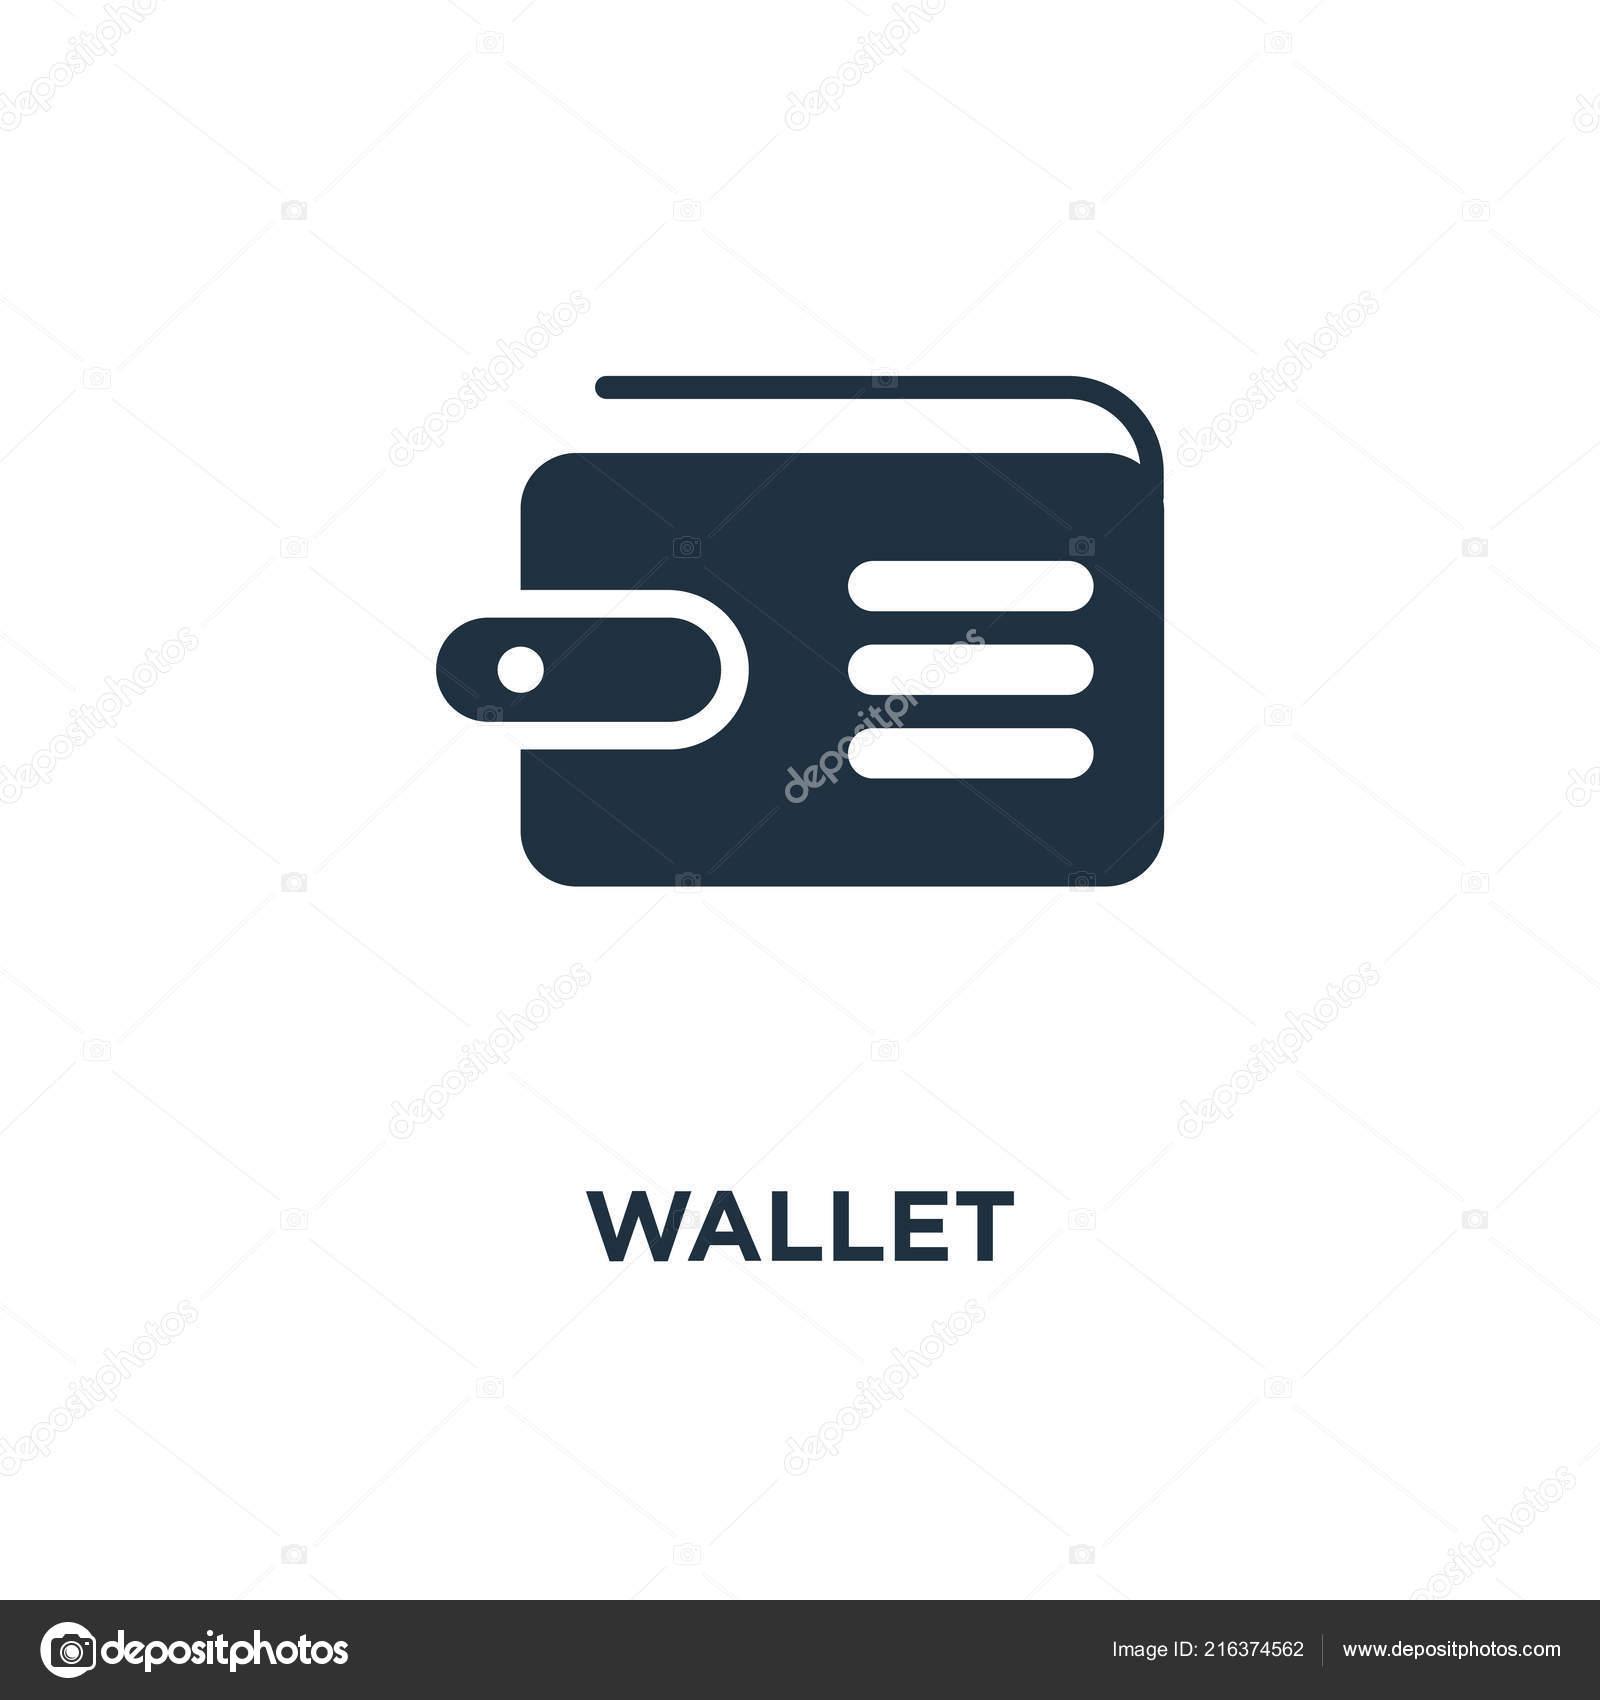 wallet icon black filled vector illustration wallet symbol white background stock vector c mmvector 216374562 depositphotos